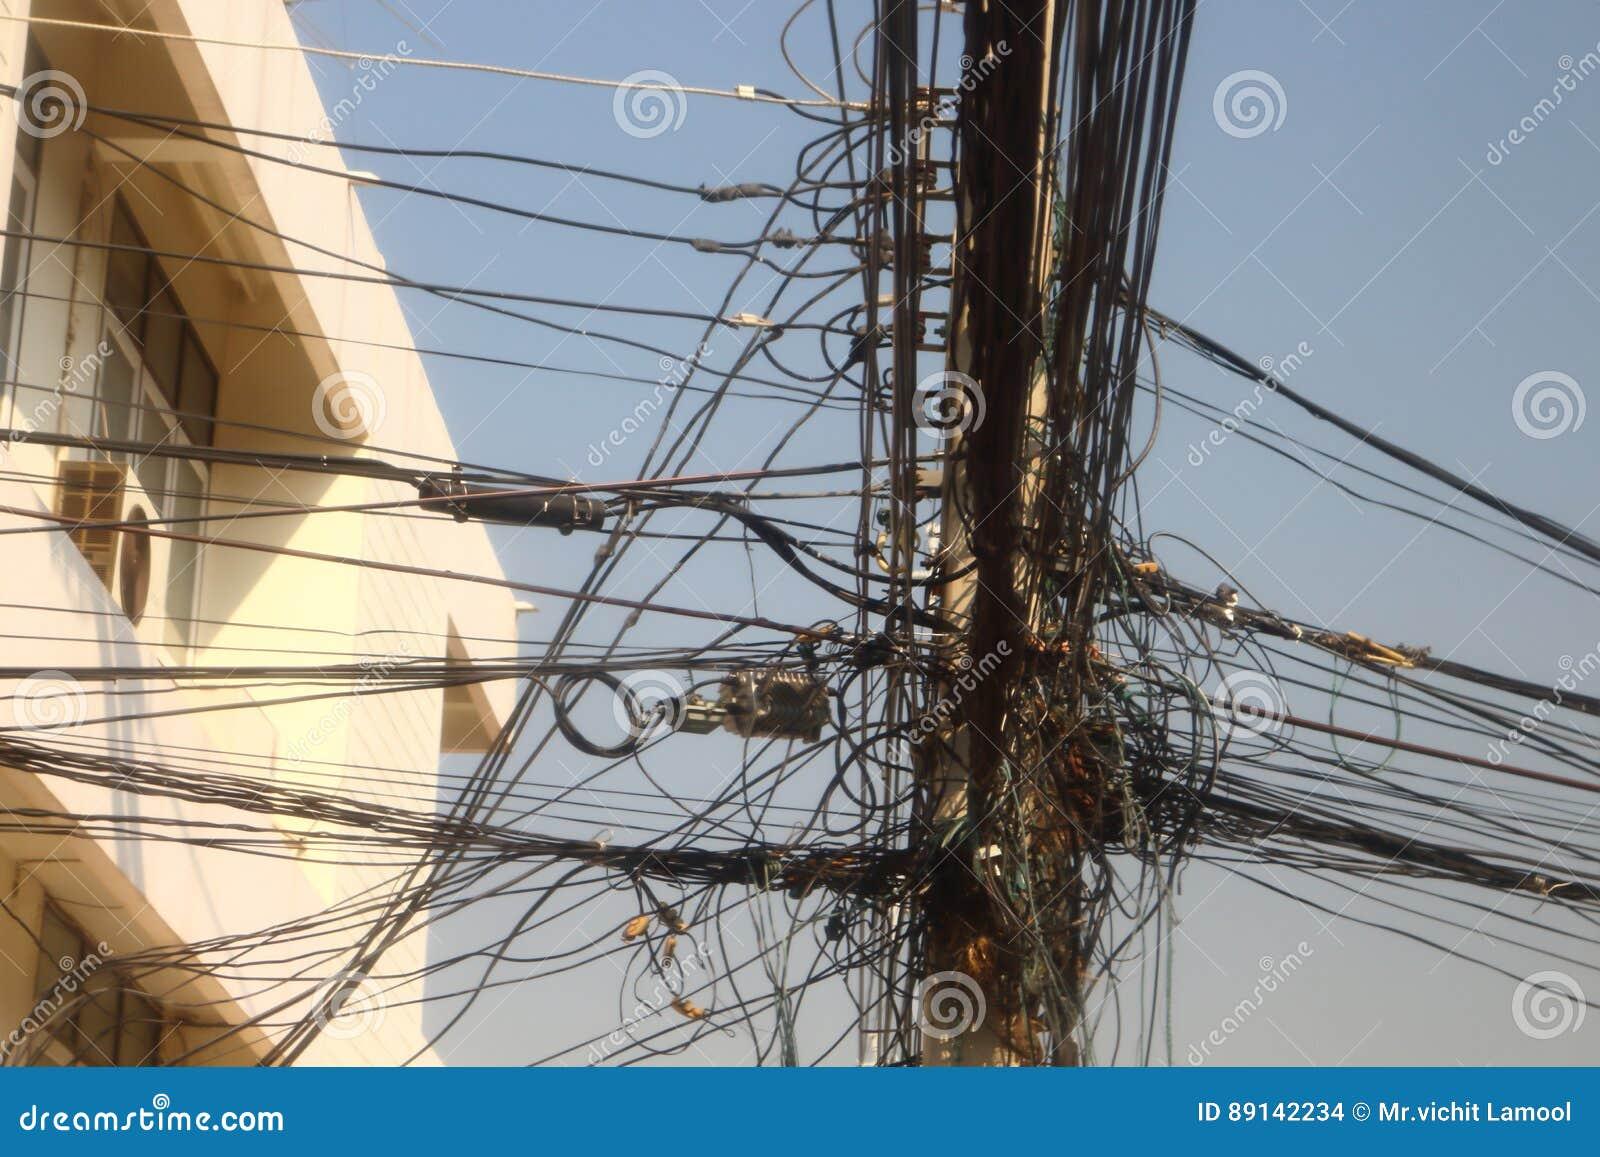 Power Poles And Many Telephone Lines. Stock Photo - Image of many ...